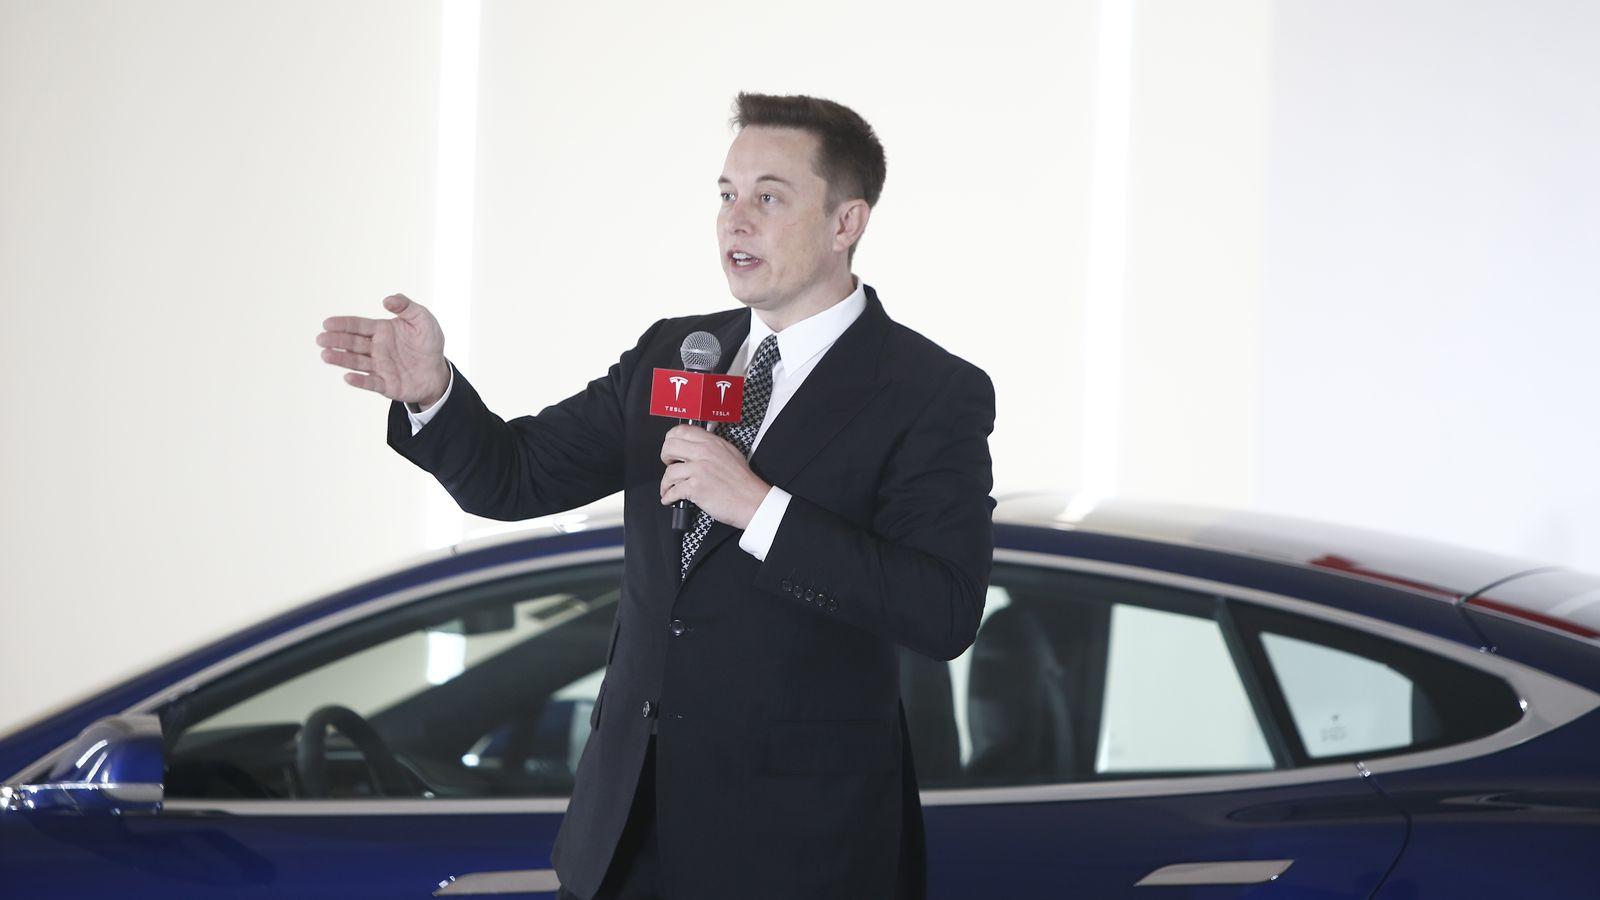 7 things we learned from Elon Musk's Tesla shareholder meeting